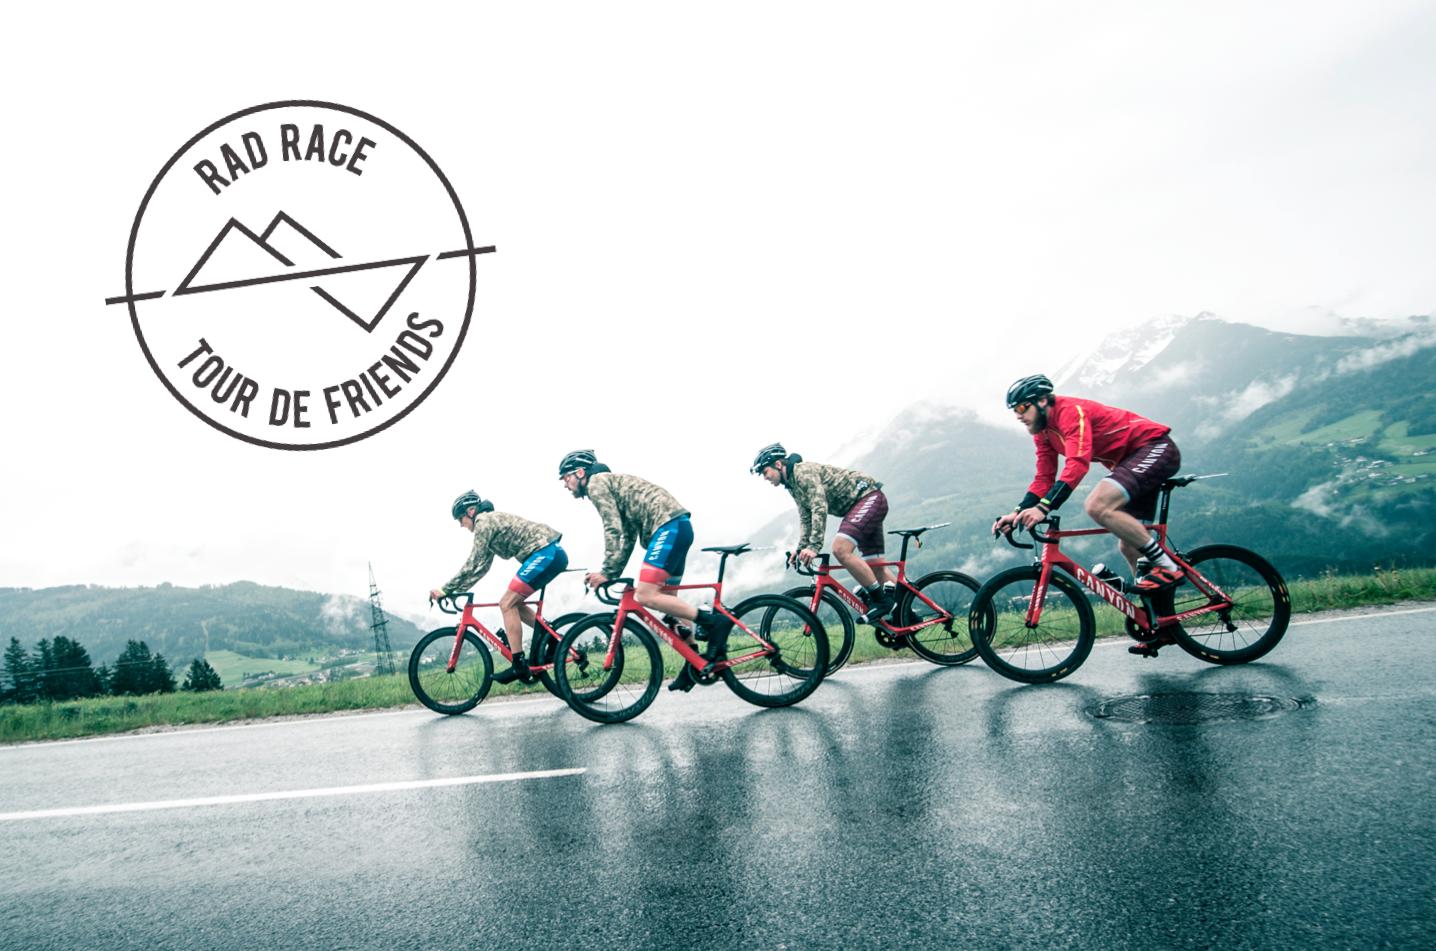 "The RAD RACE ""TOUR DE FRIENDS"" WILL BE AN EPIC STAGE RACE FROM MUNICH - VENICE. SHOT BY Björn reschabek."